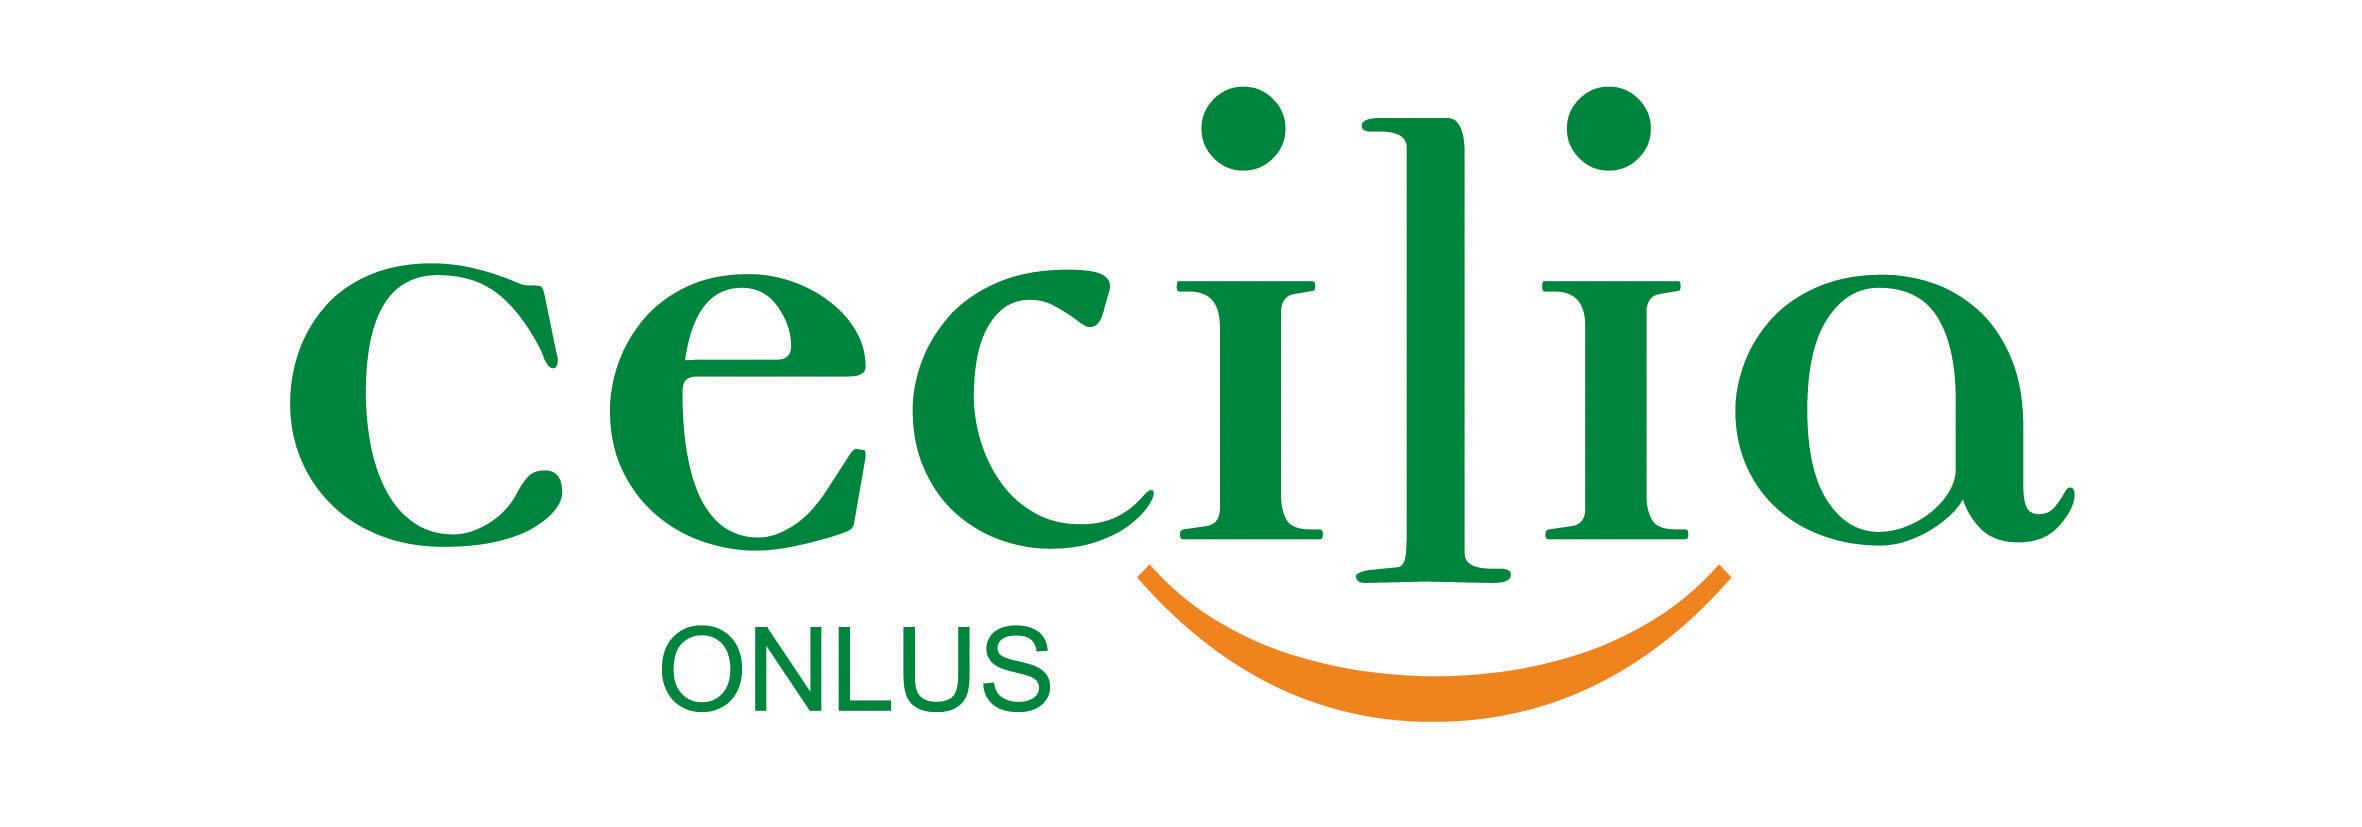 Cooperativa Cecilia Onlus